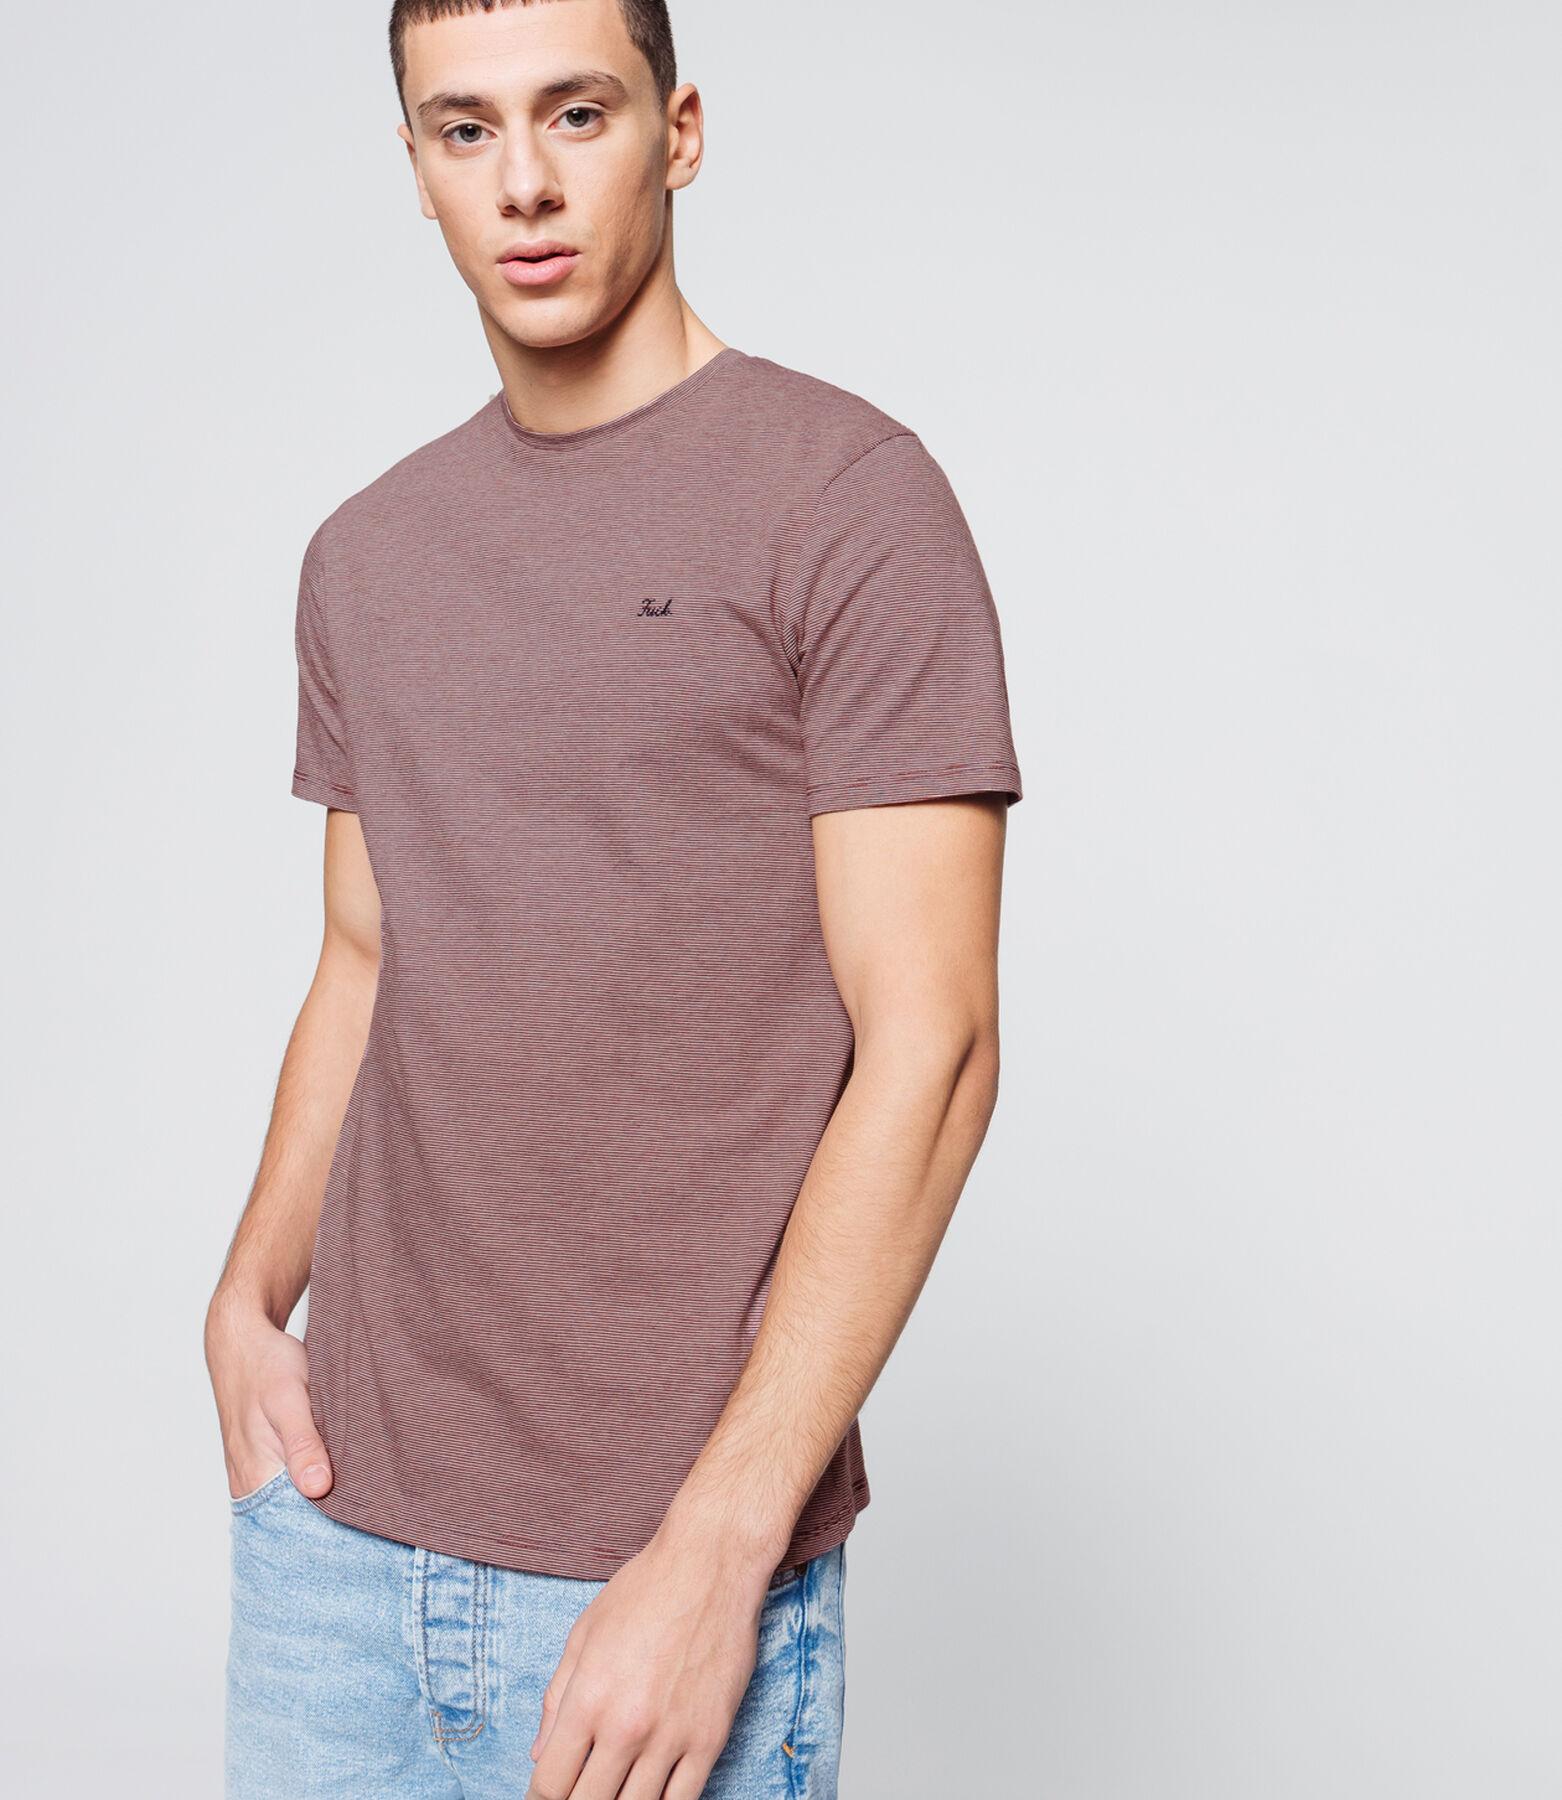 T-shirt matière fantaisie, broderie poitrine